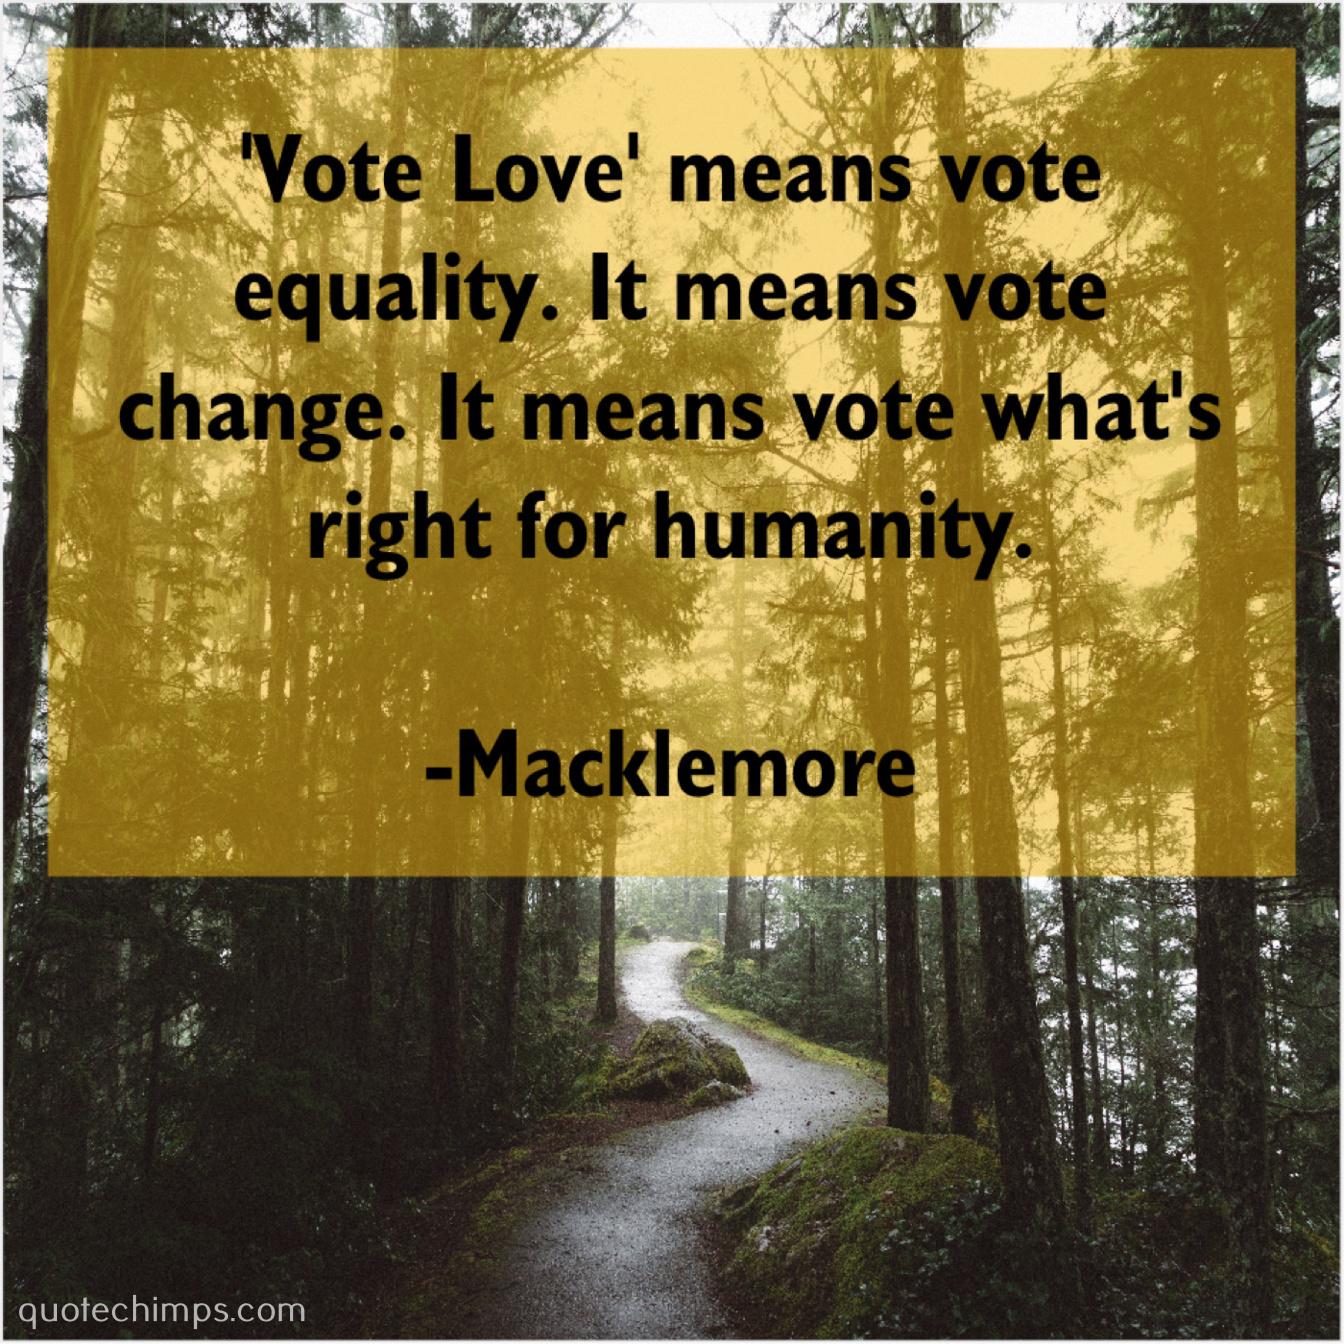 Macklemore Vote Love Means Vote Equality